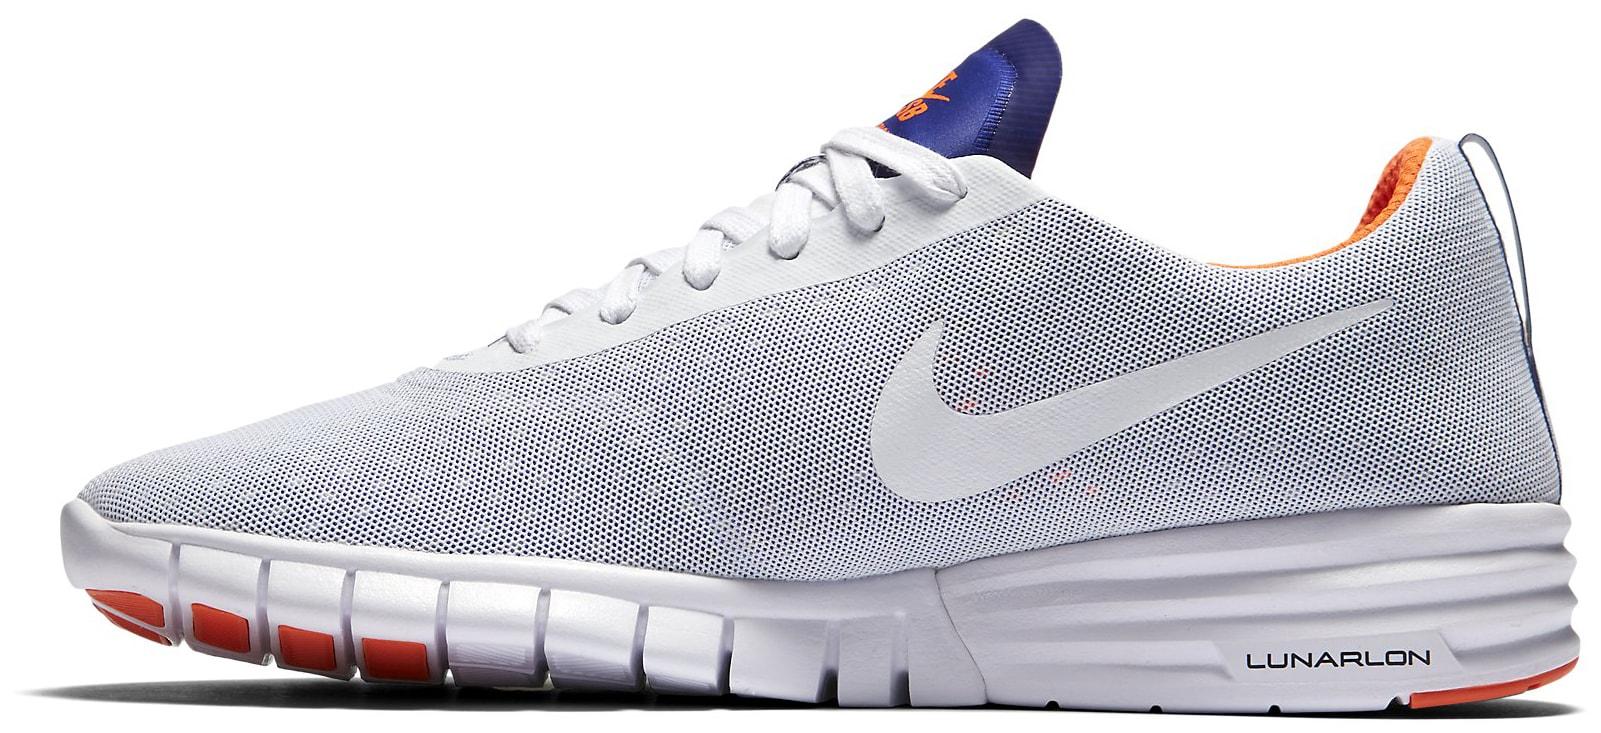 6c067747549b Nike SB Lunar Paul Rodriguez 9 Skate Shoes - thumbnail 2